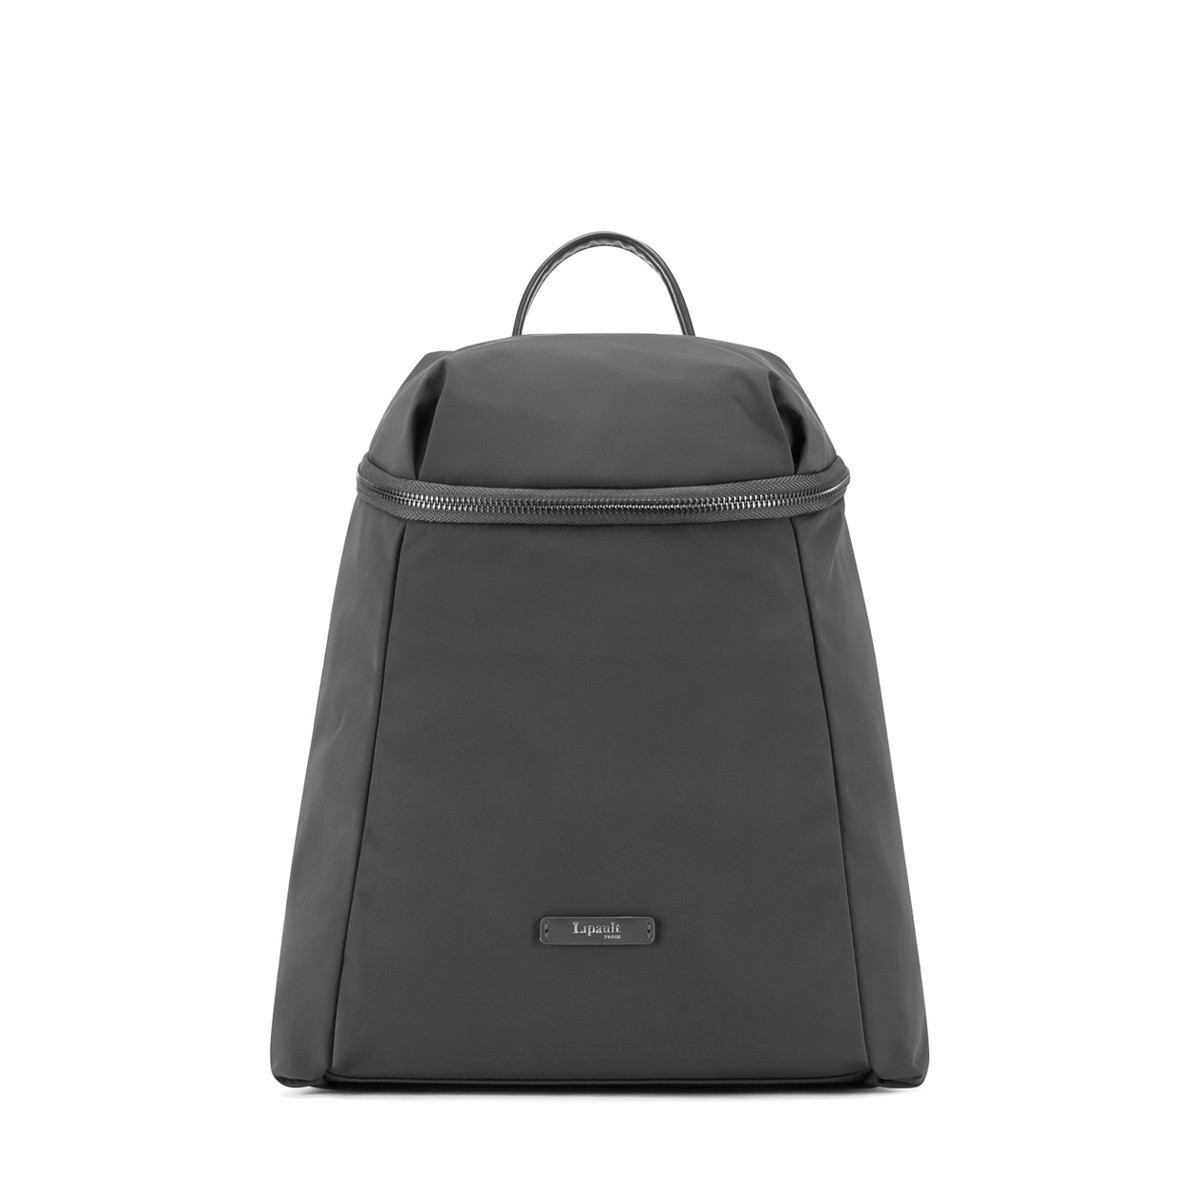 Lipault 2018年新款双肩包DD4002欧美时尚大容量背包休闲防泼水女士书包